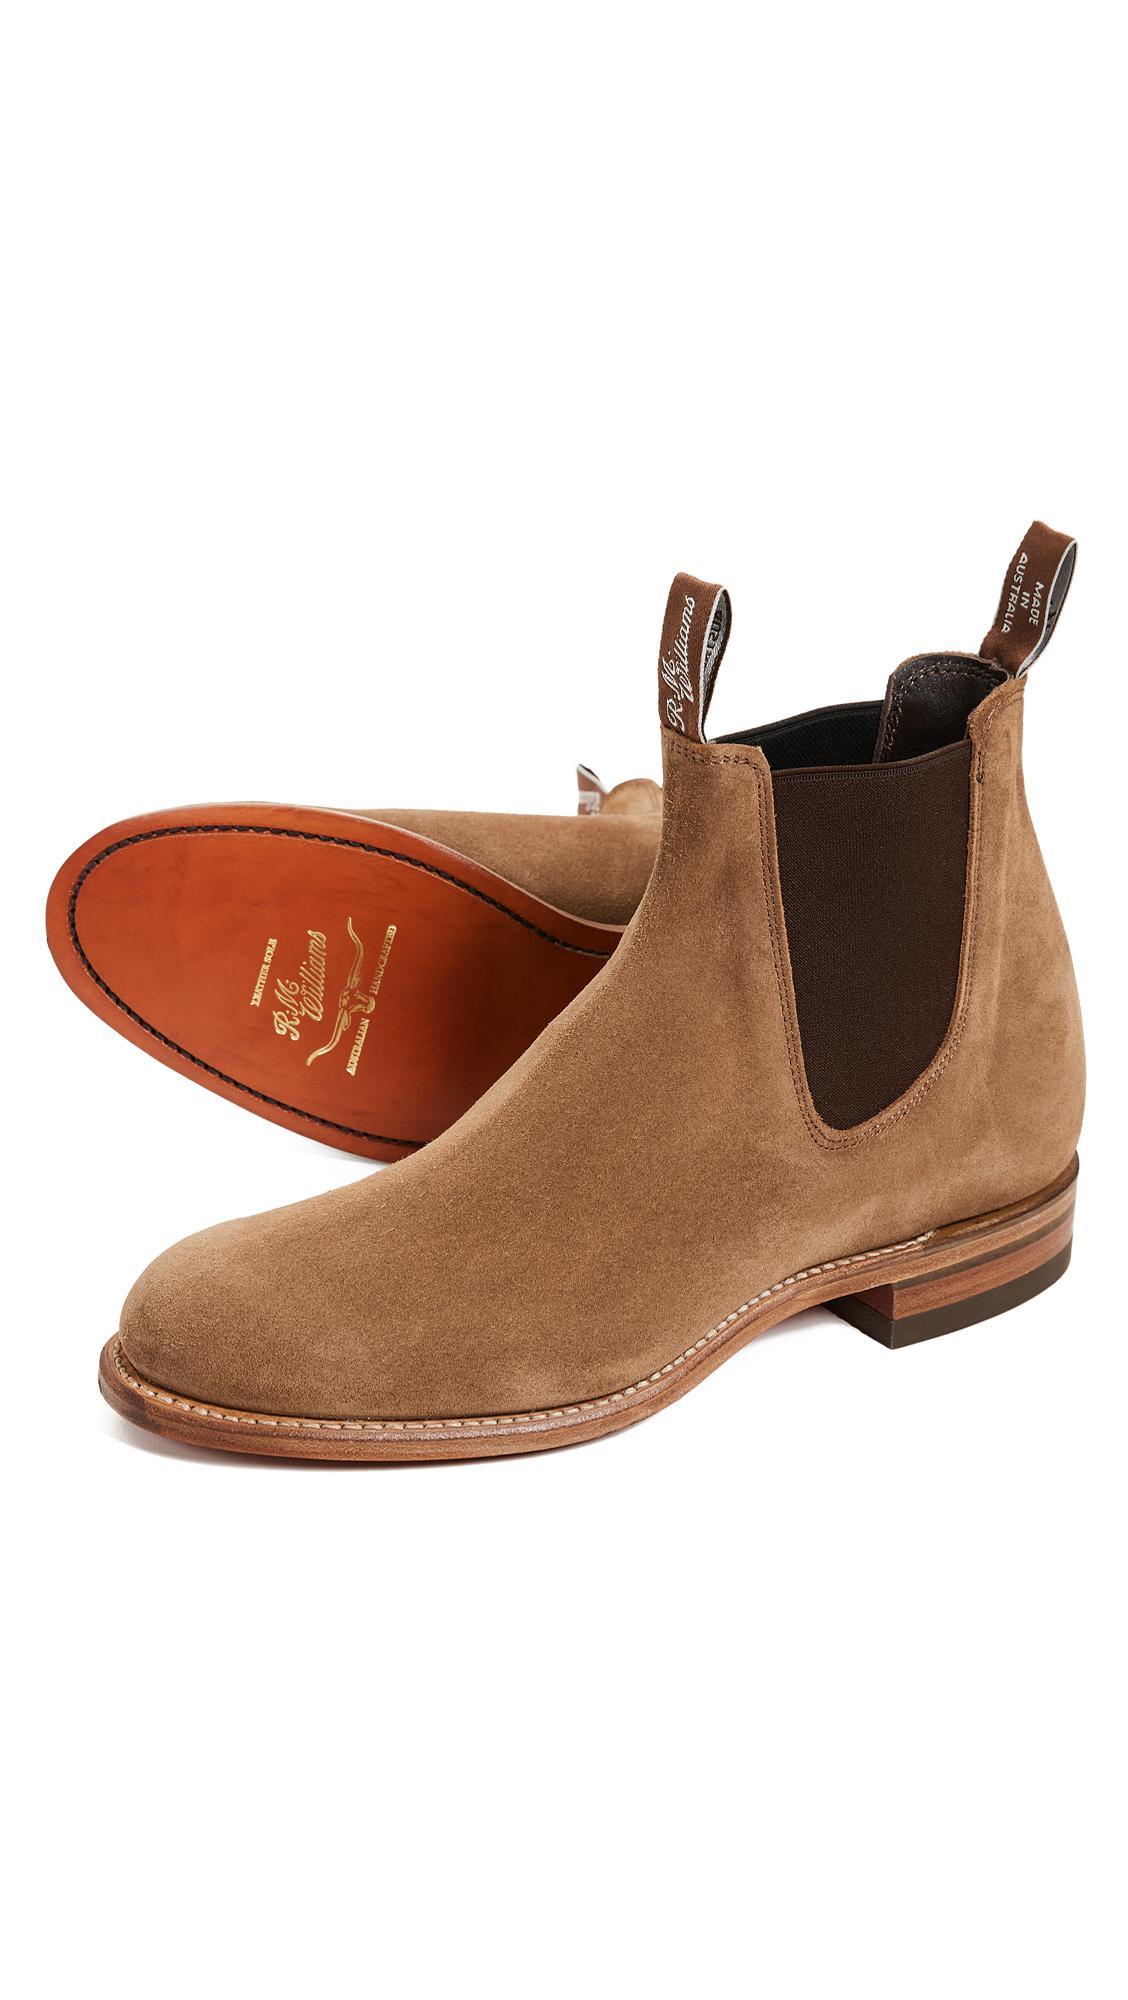 Flat Heel Boots - Saddle R.M. Williams PXq6AUq